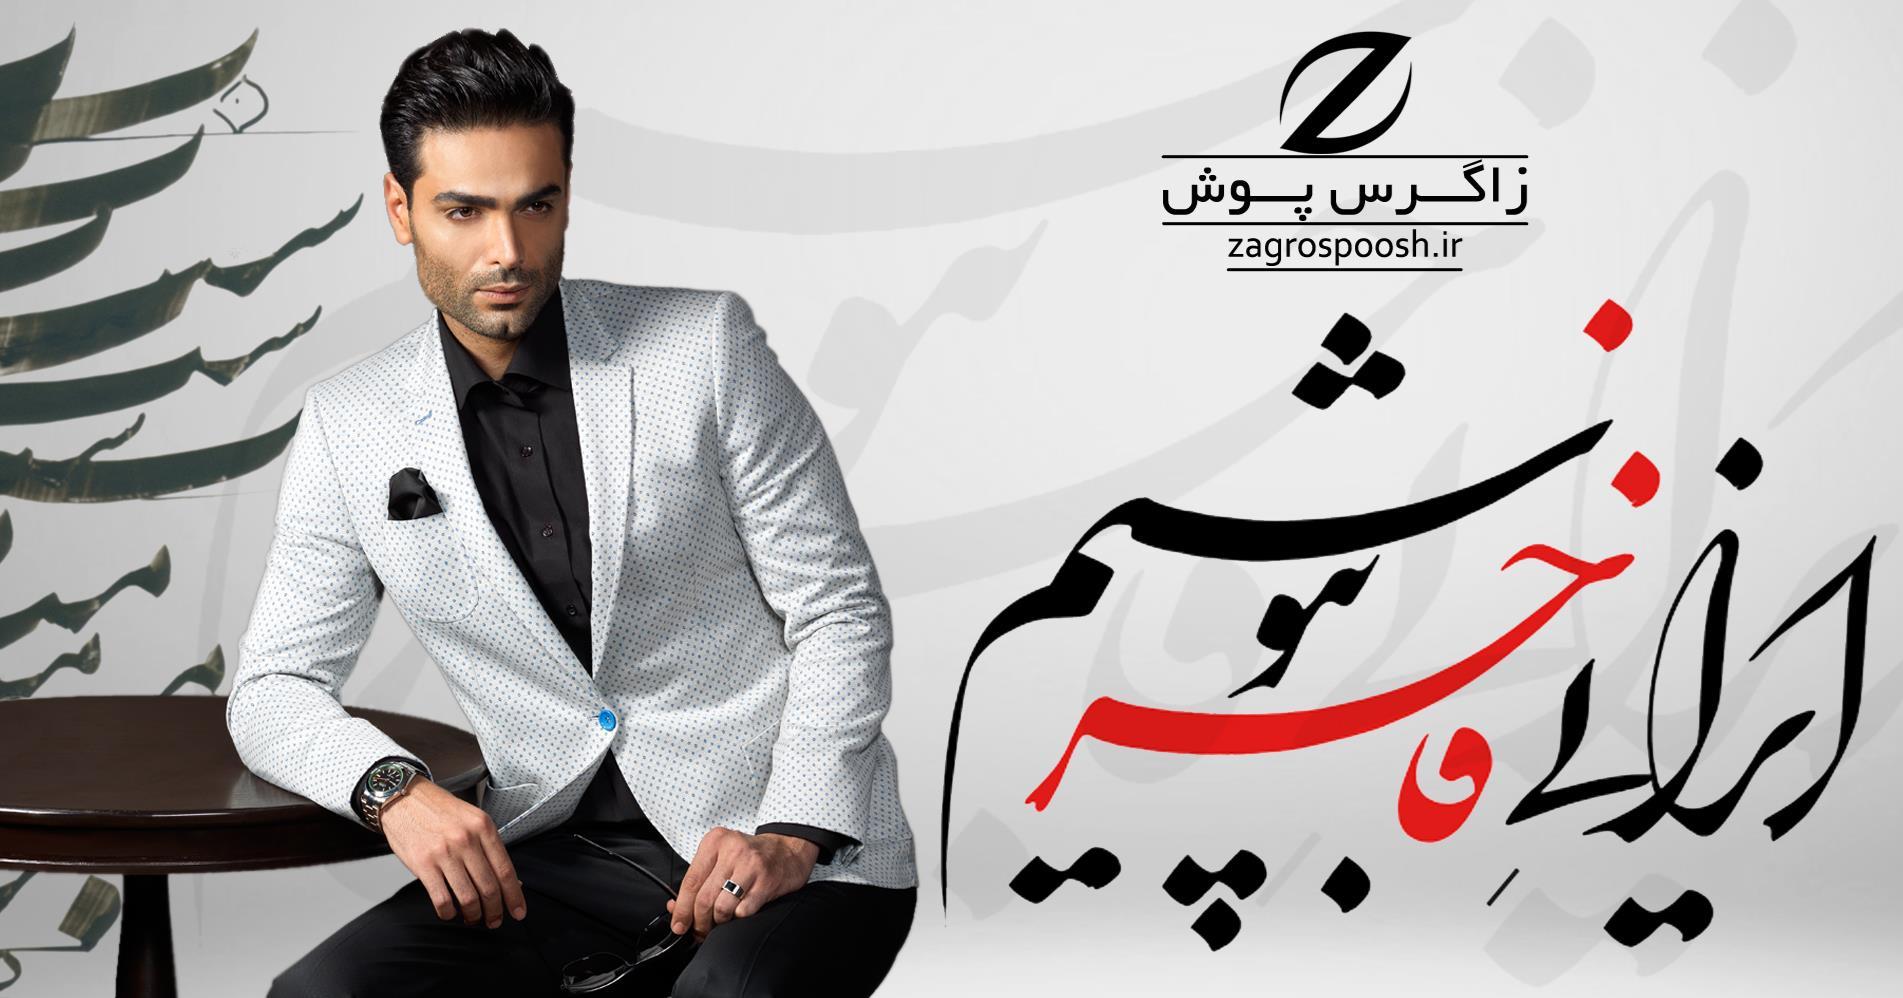 ایرانی فاخر بپوشیم. #کت#کت تک